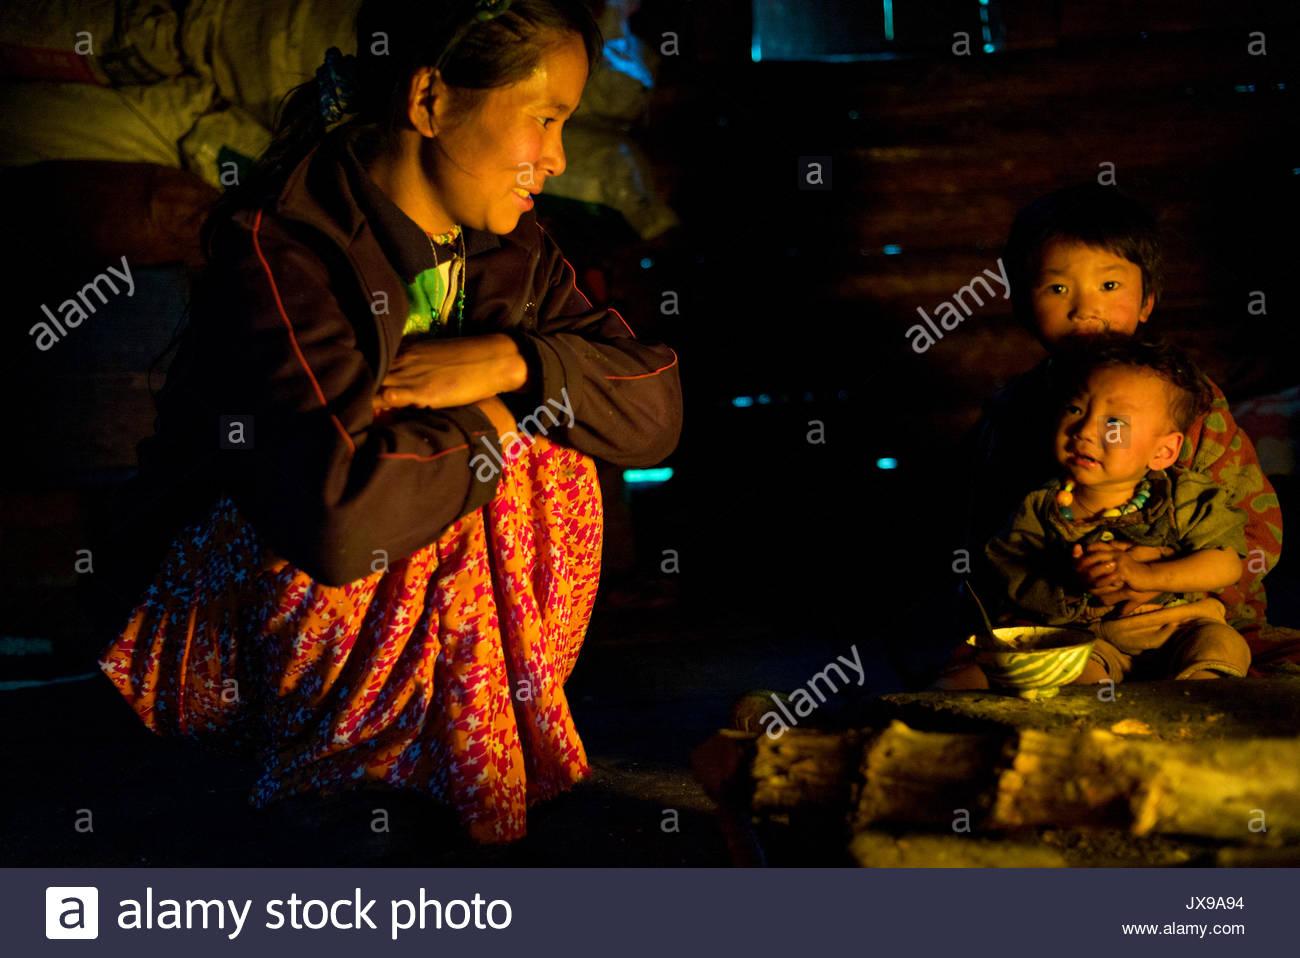 Buddhist villagers huddle around a fire. - Stock Image